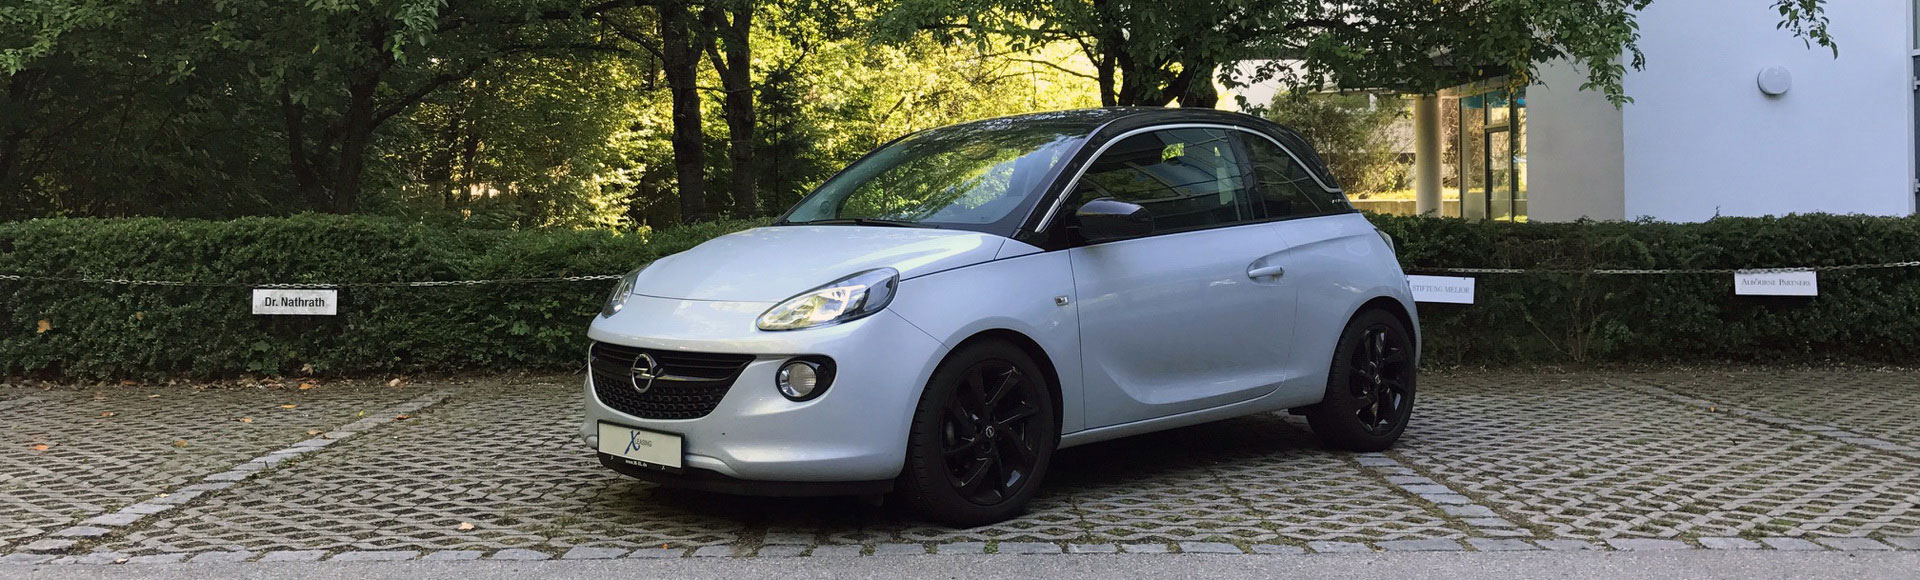 Opel Adam 2017 Sommer 6127